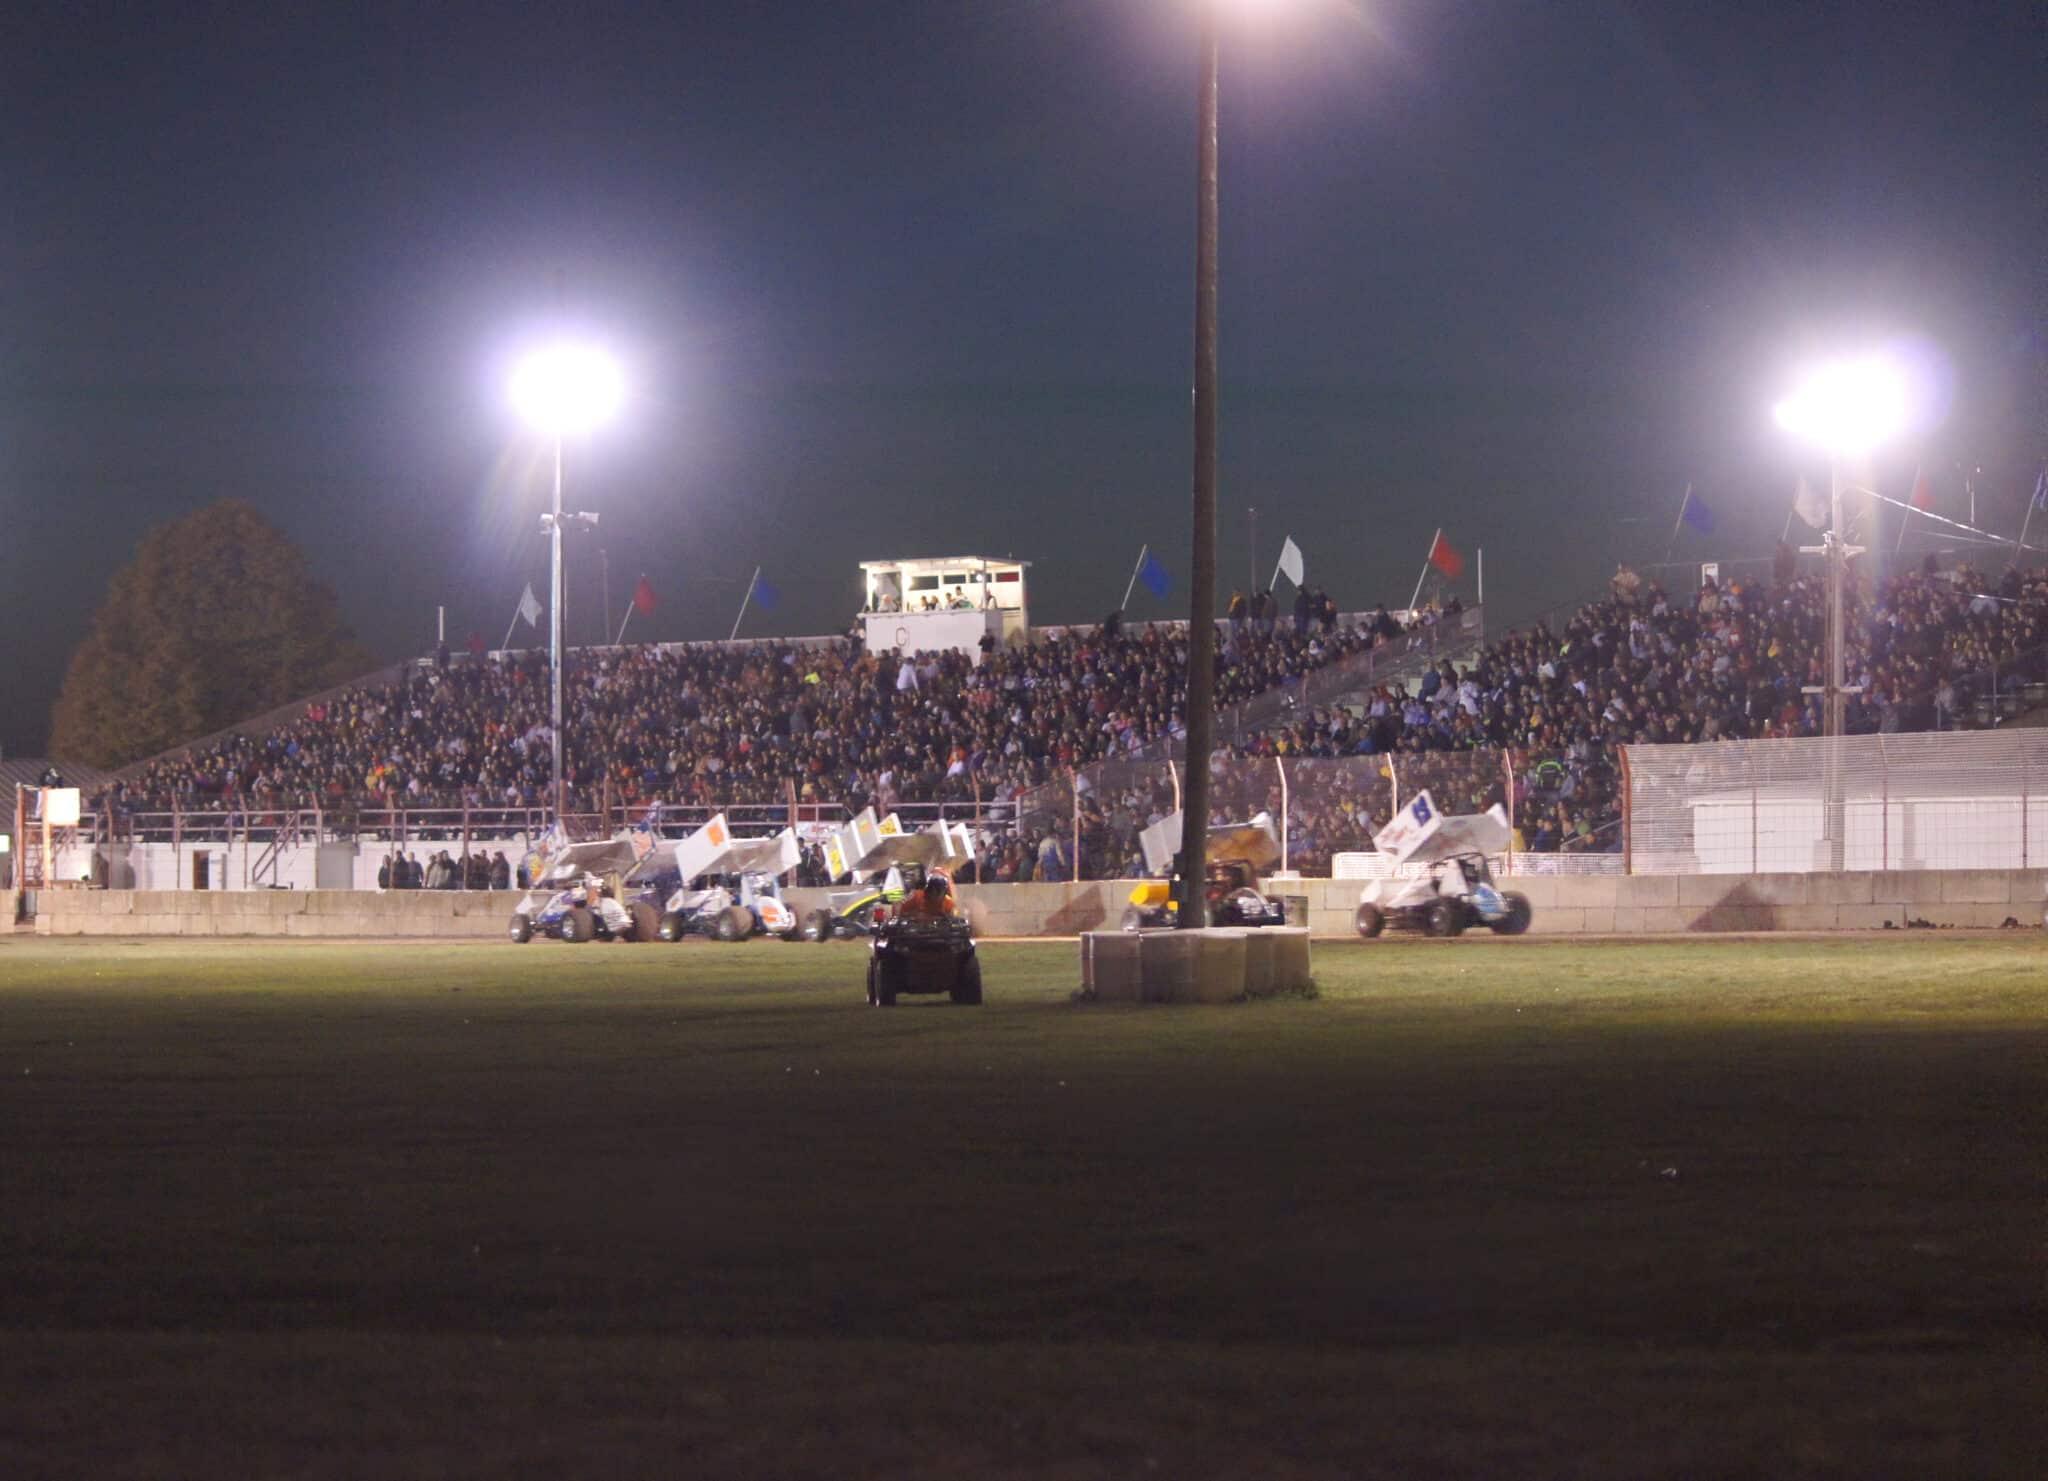 Full Grandstands on Race Night